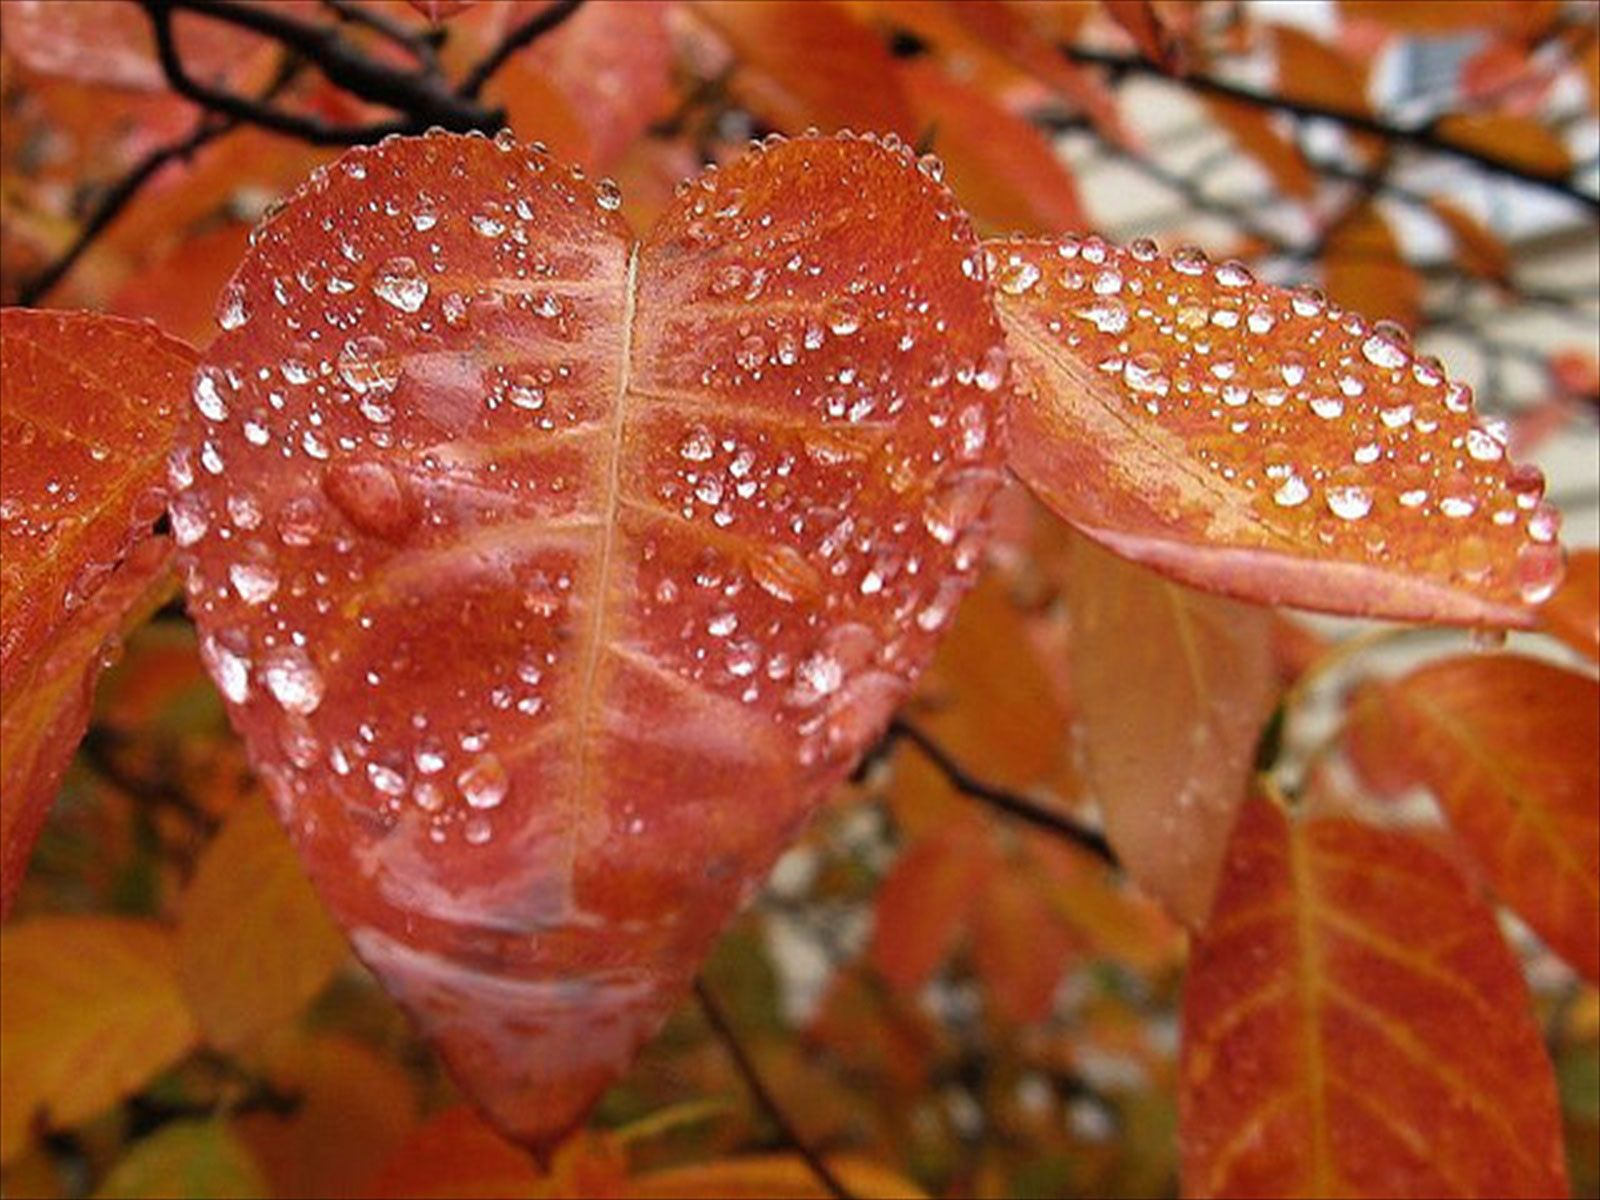 Rain Wallpaper Best Collection Of Rainy Desktop Hd Wallpaper Rain Photography Amazing Nature Photography Rain Wallpapers